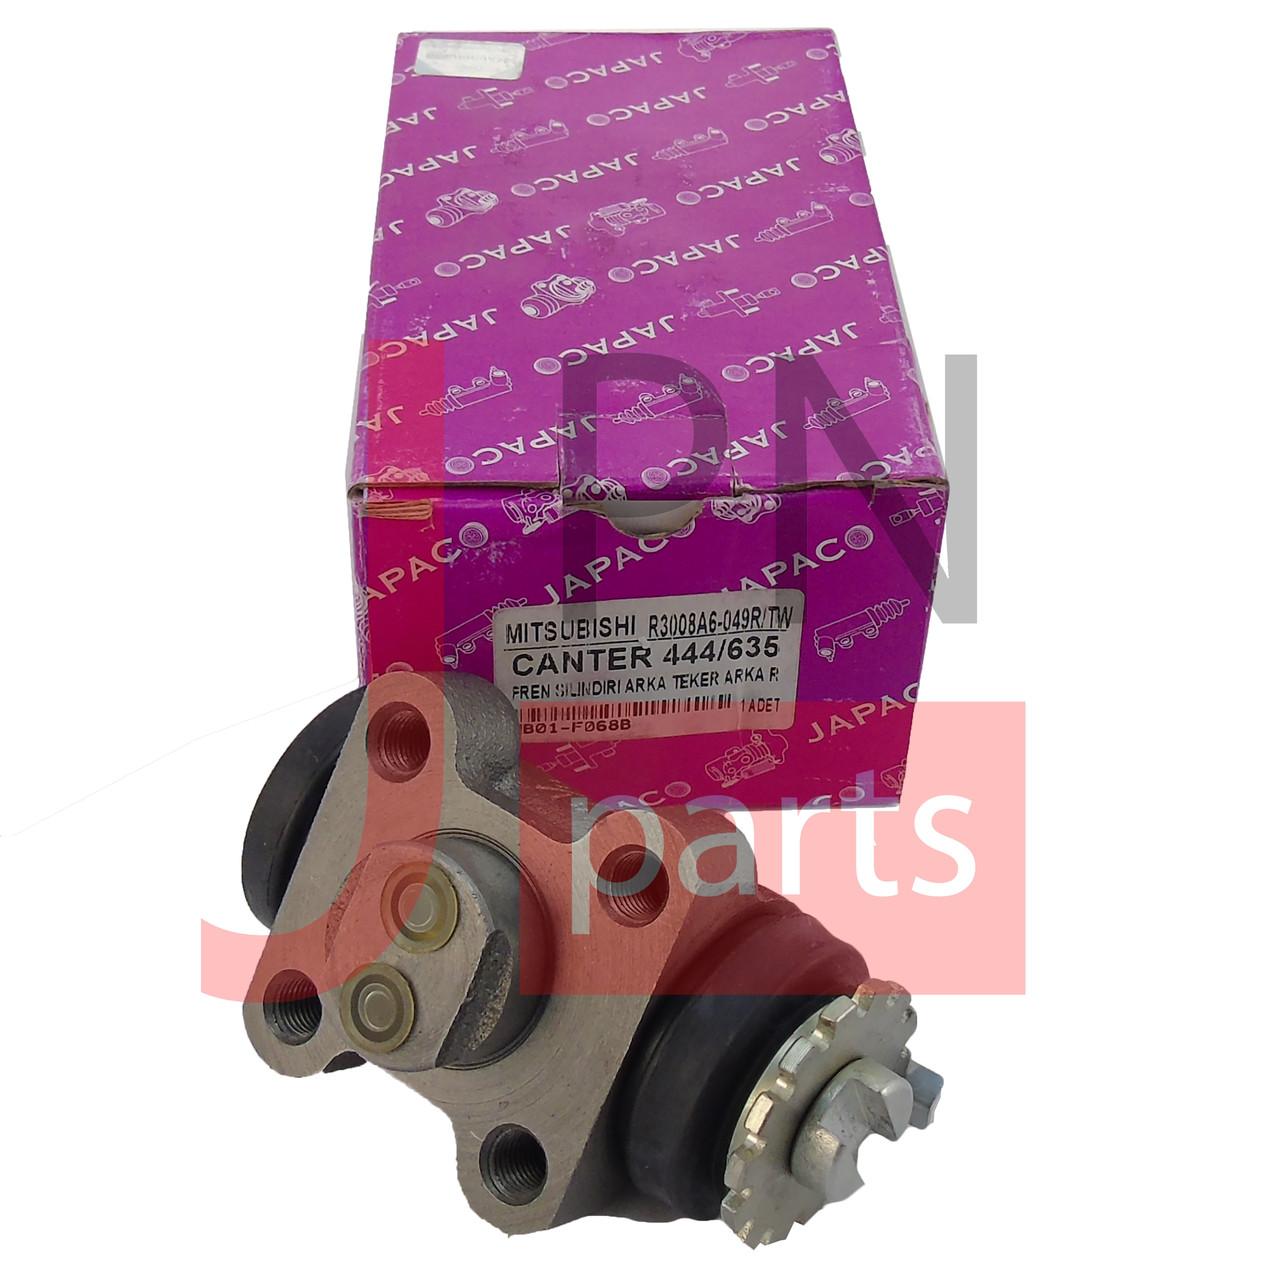 Цилиндр тормозной задний правый задний CANTER 434/444/635 (MB060583) JAPACO